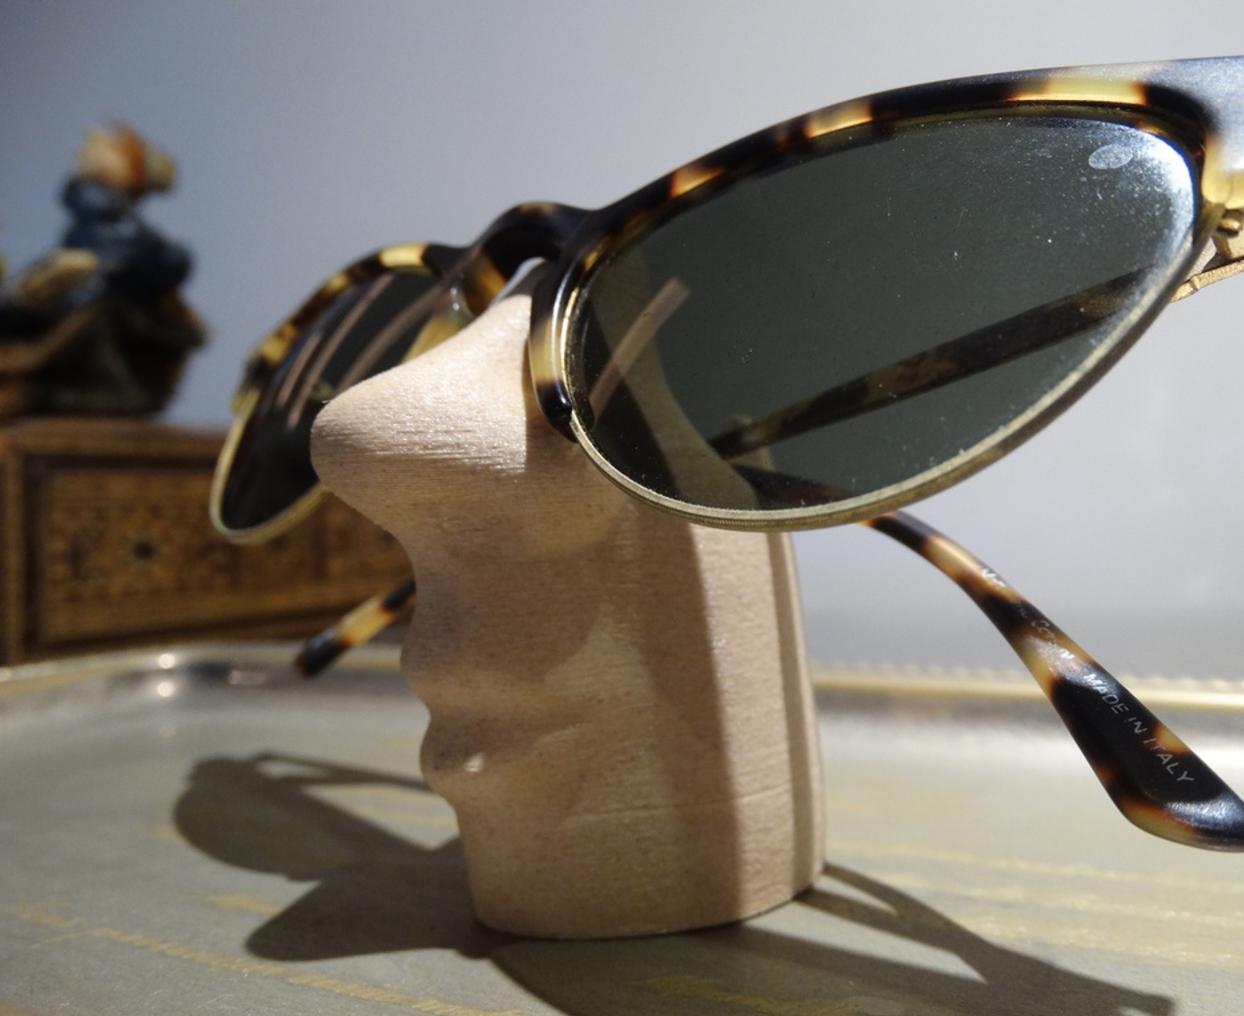 Capture d'écran 2016-11-22 à 18.52.13.png Download free STL file Nose Glasses Support • 3D printer object, 3Delivery